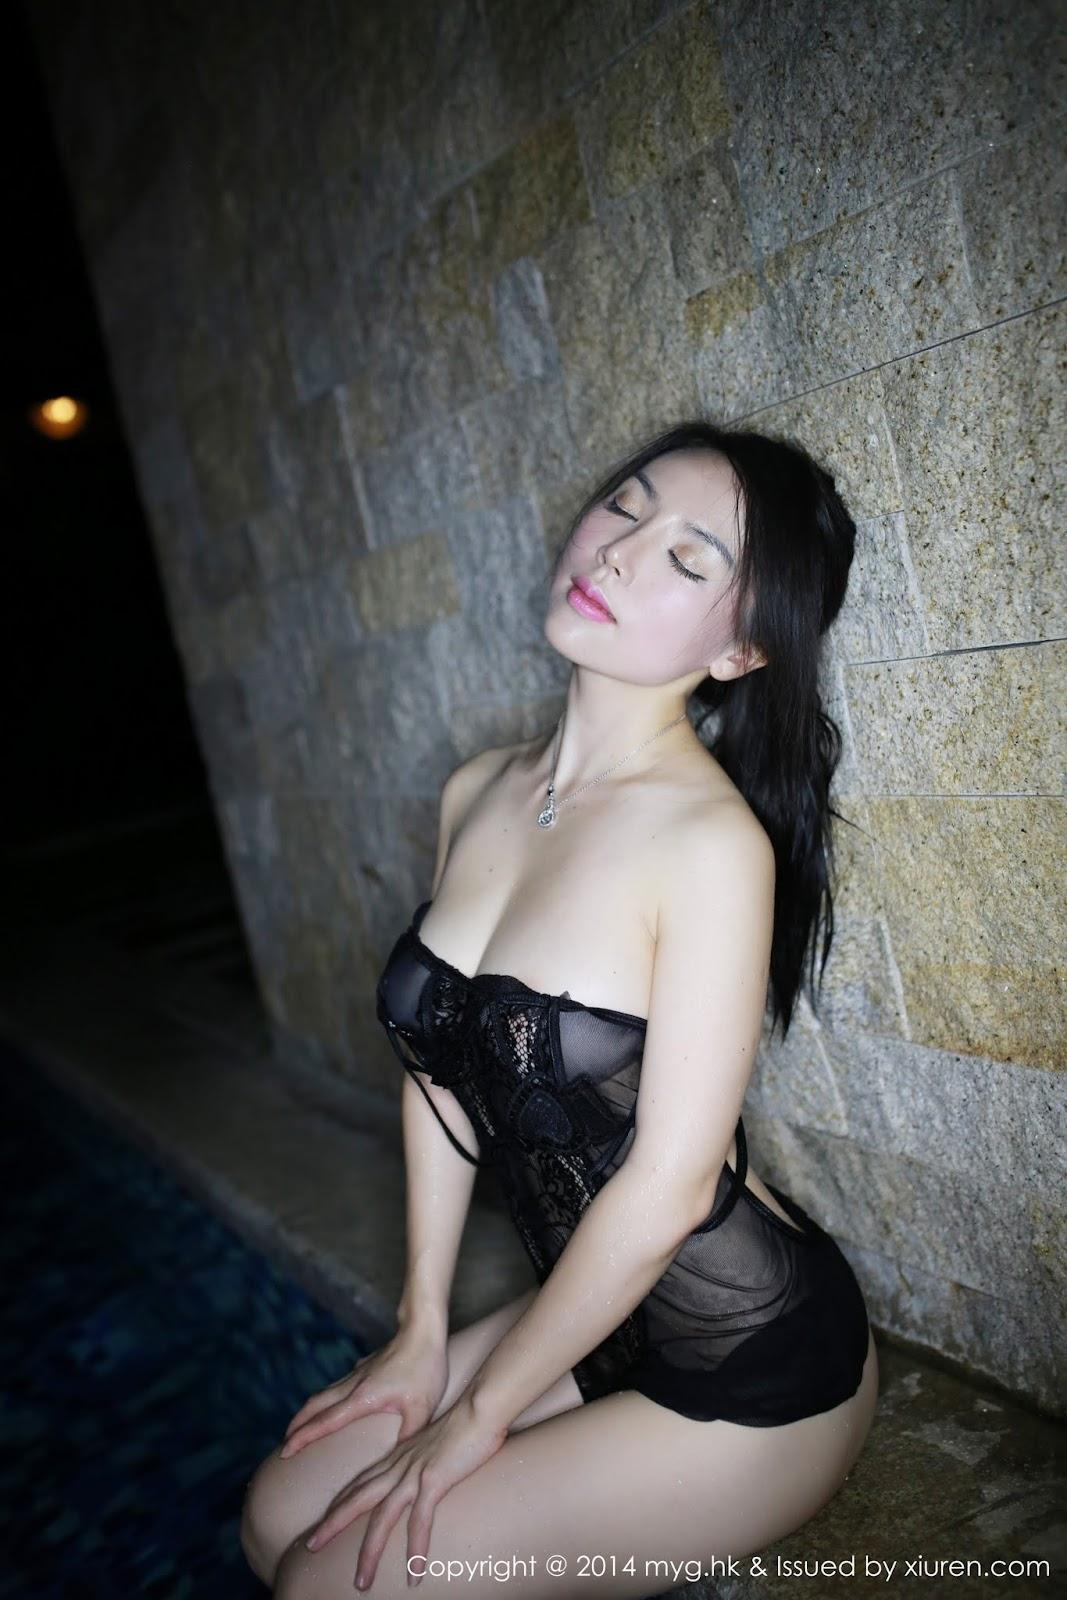 30065 074 - MYGIRL VOL.30 Photo Nude Hot Sexy